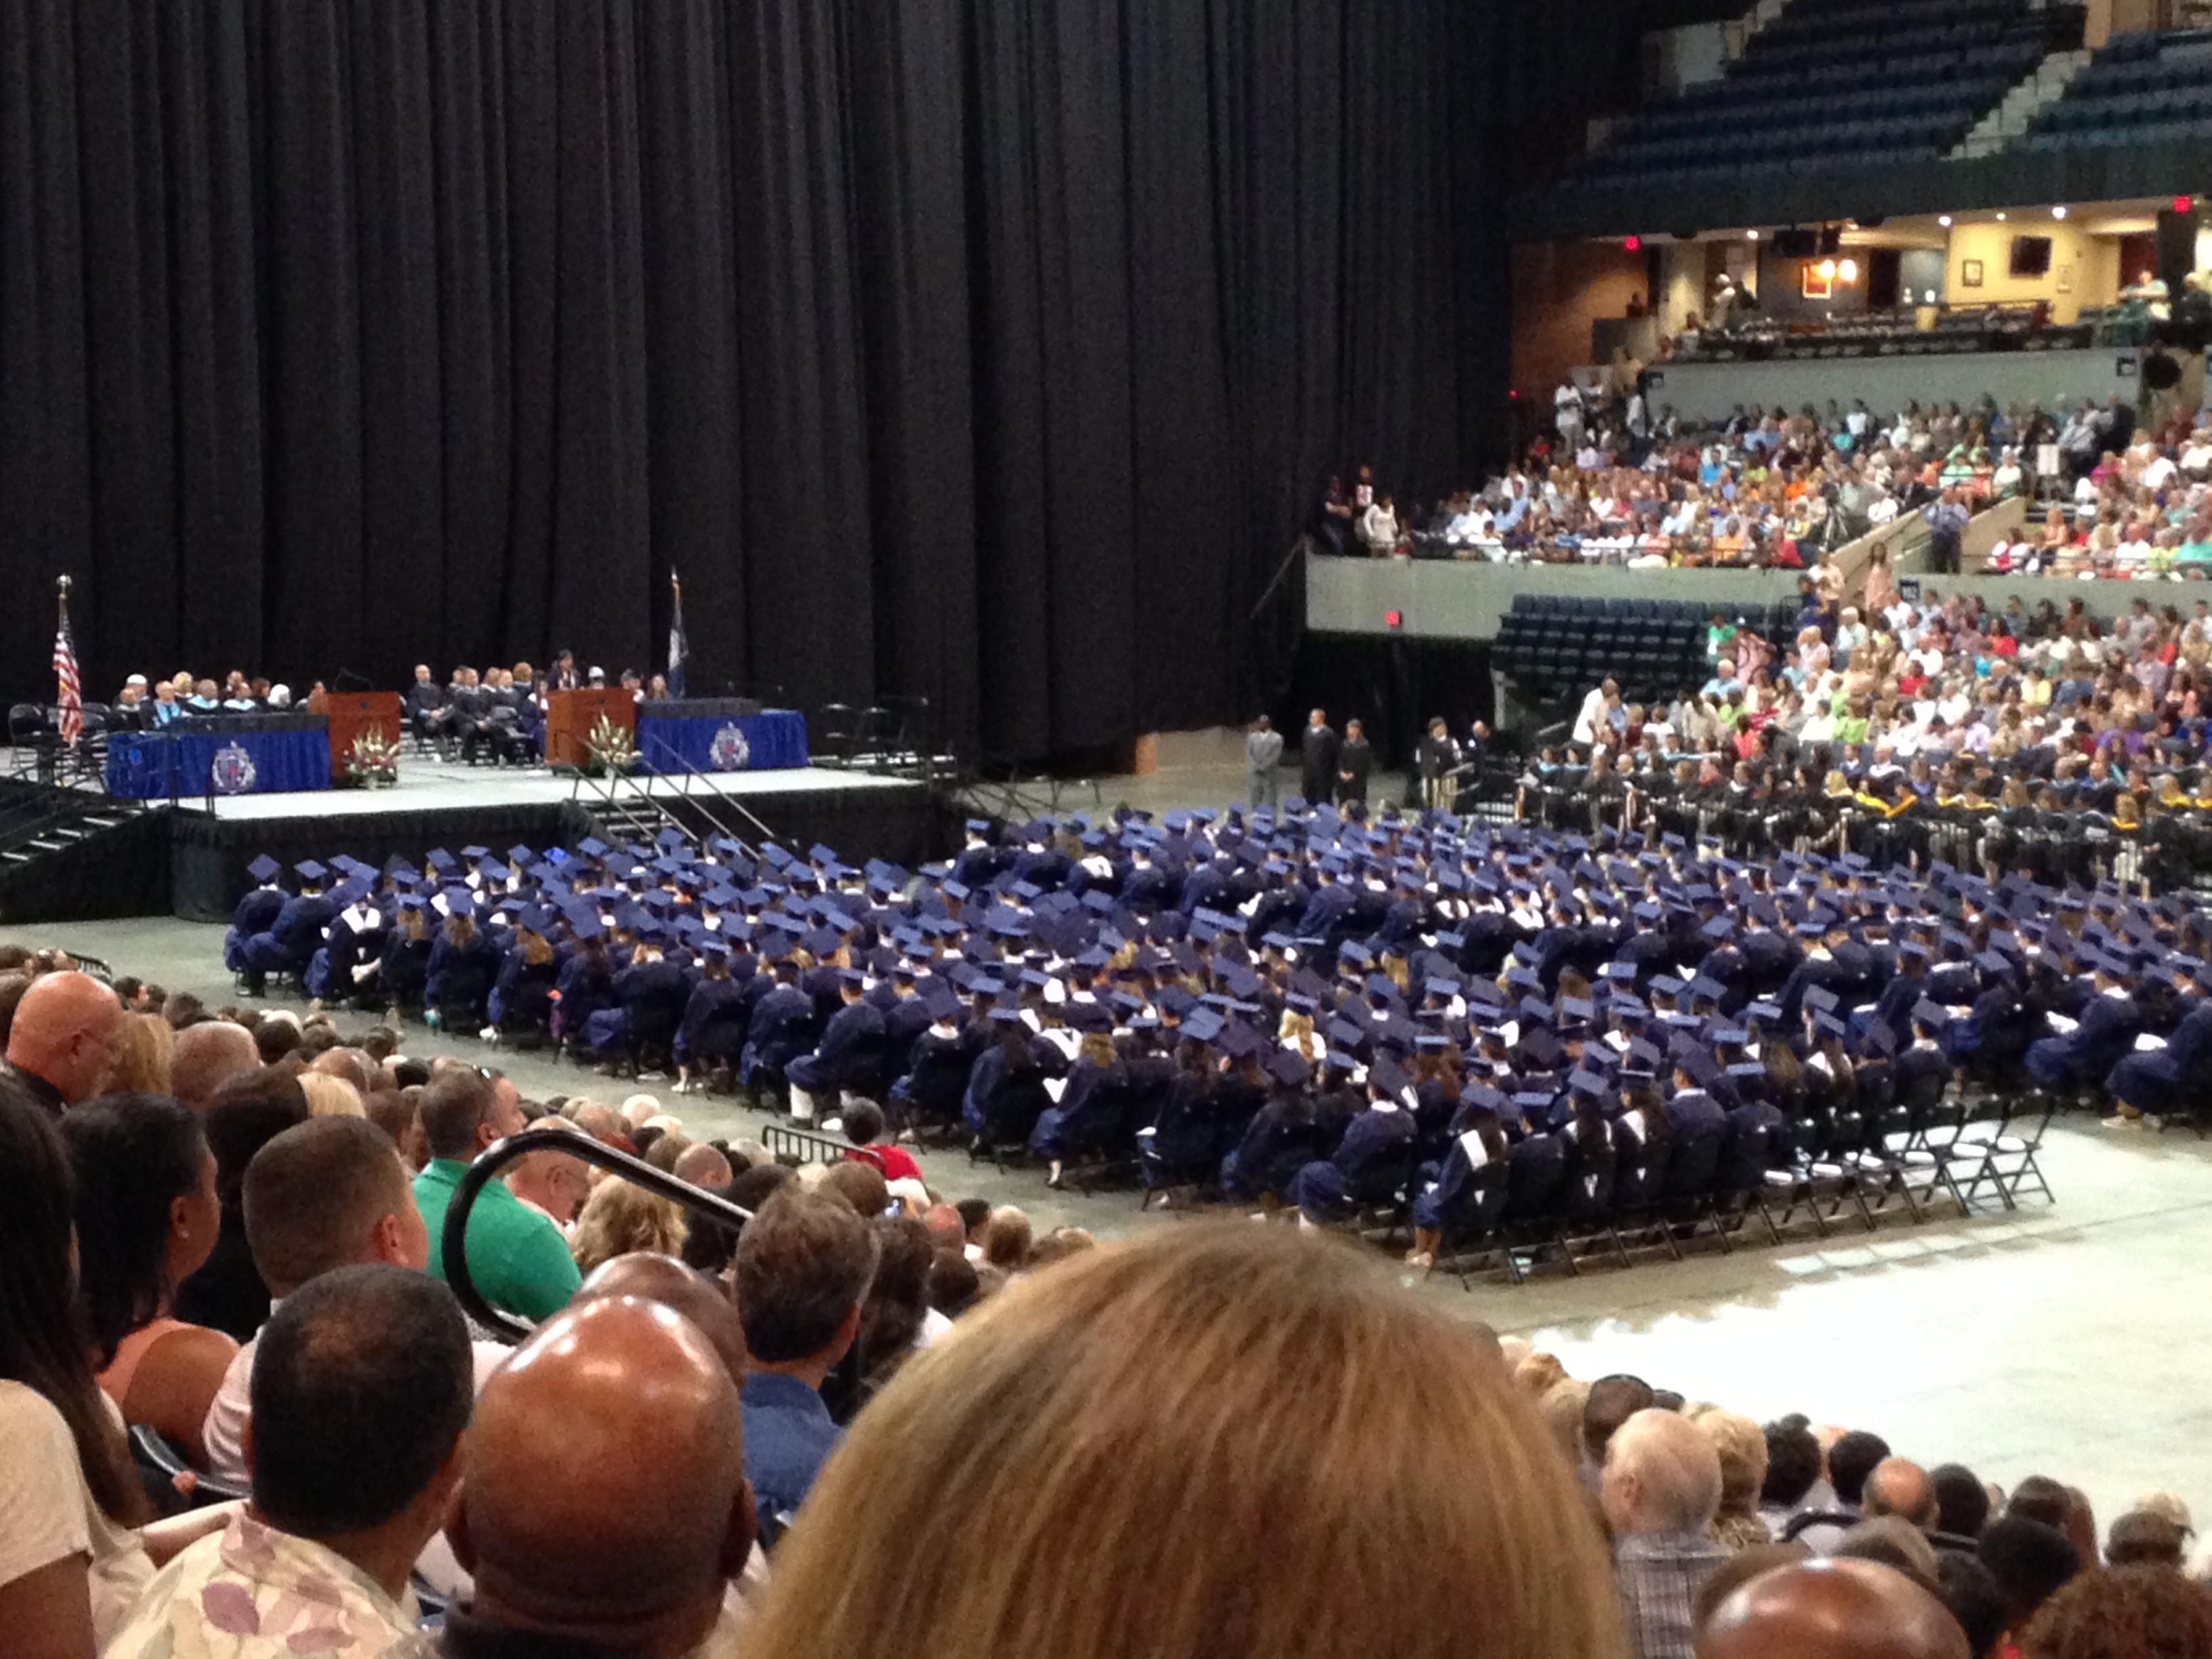 The sea of graduating students.